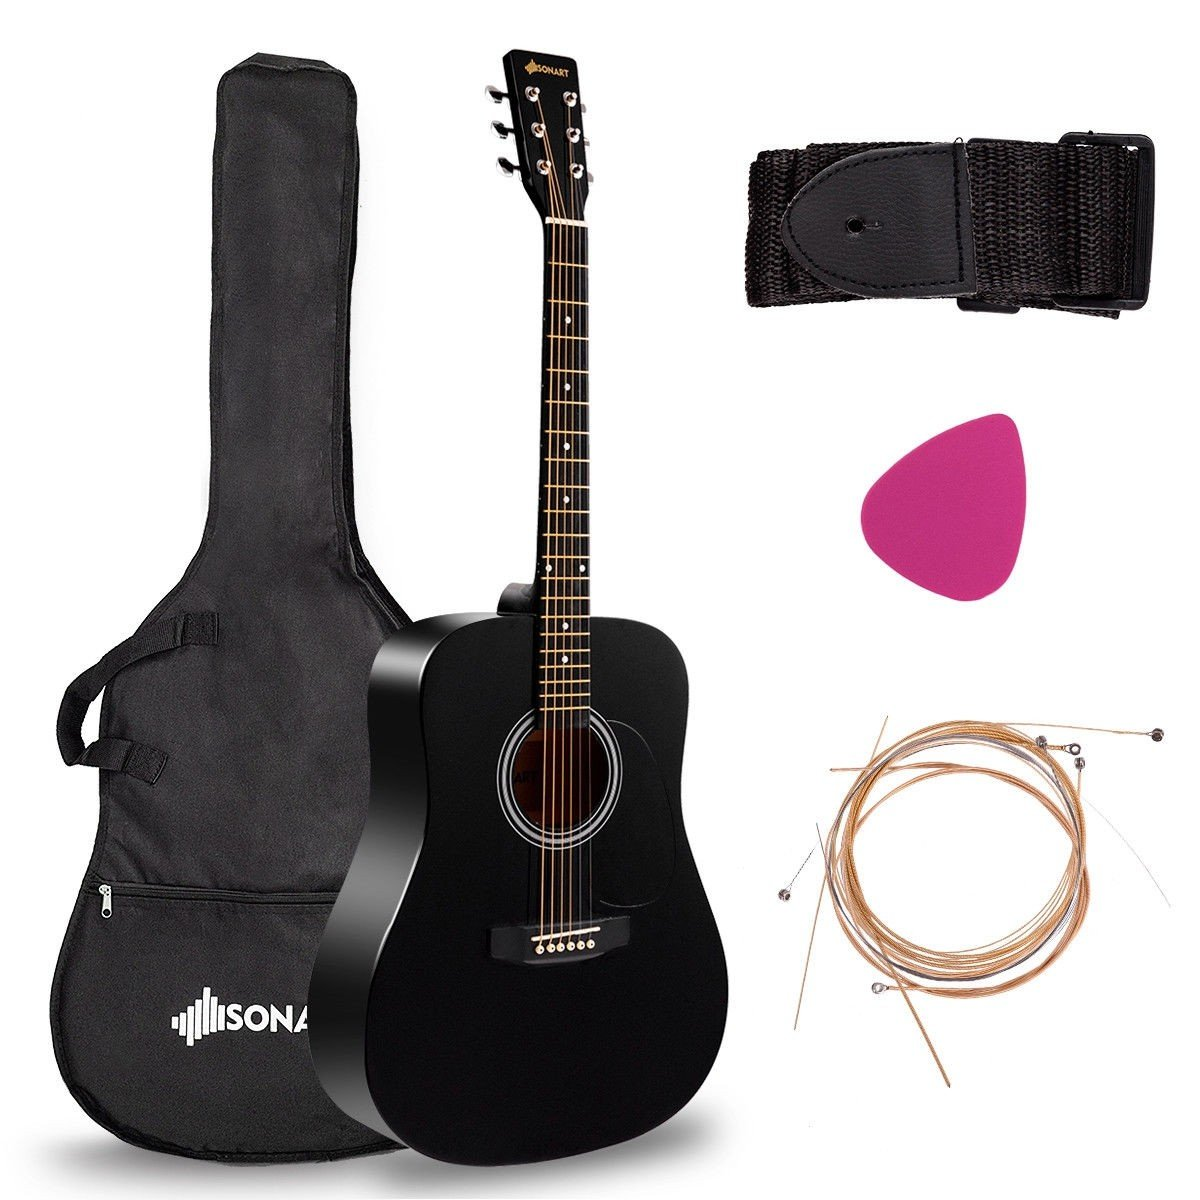 Sonart 41 6 Strings Acoustic Folk Guitar In 2020 Acoustic Guitar Guitar Acoustic